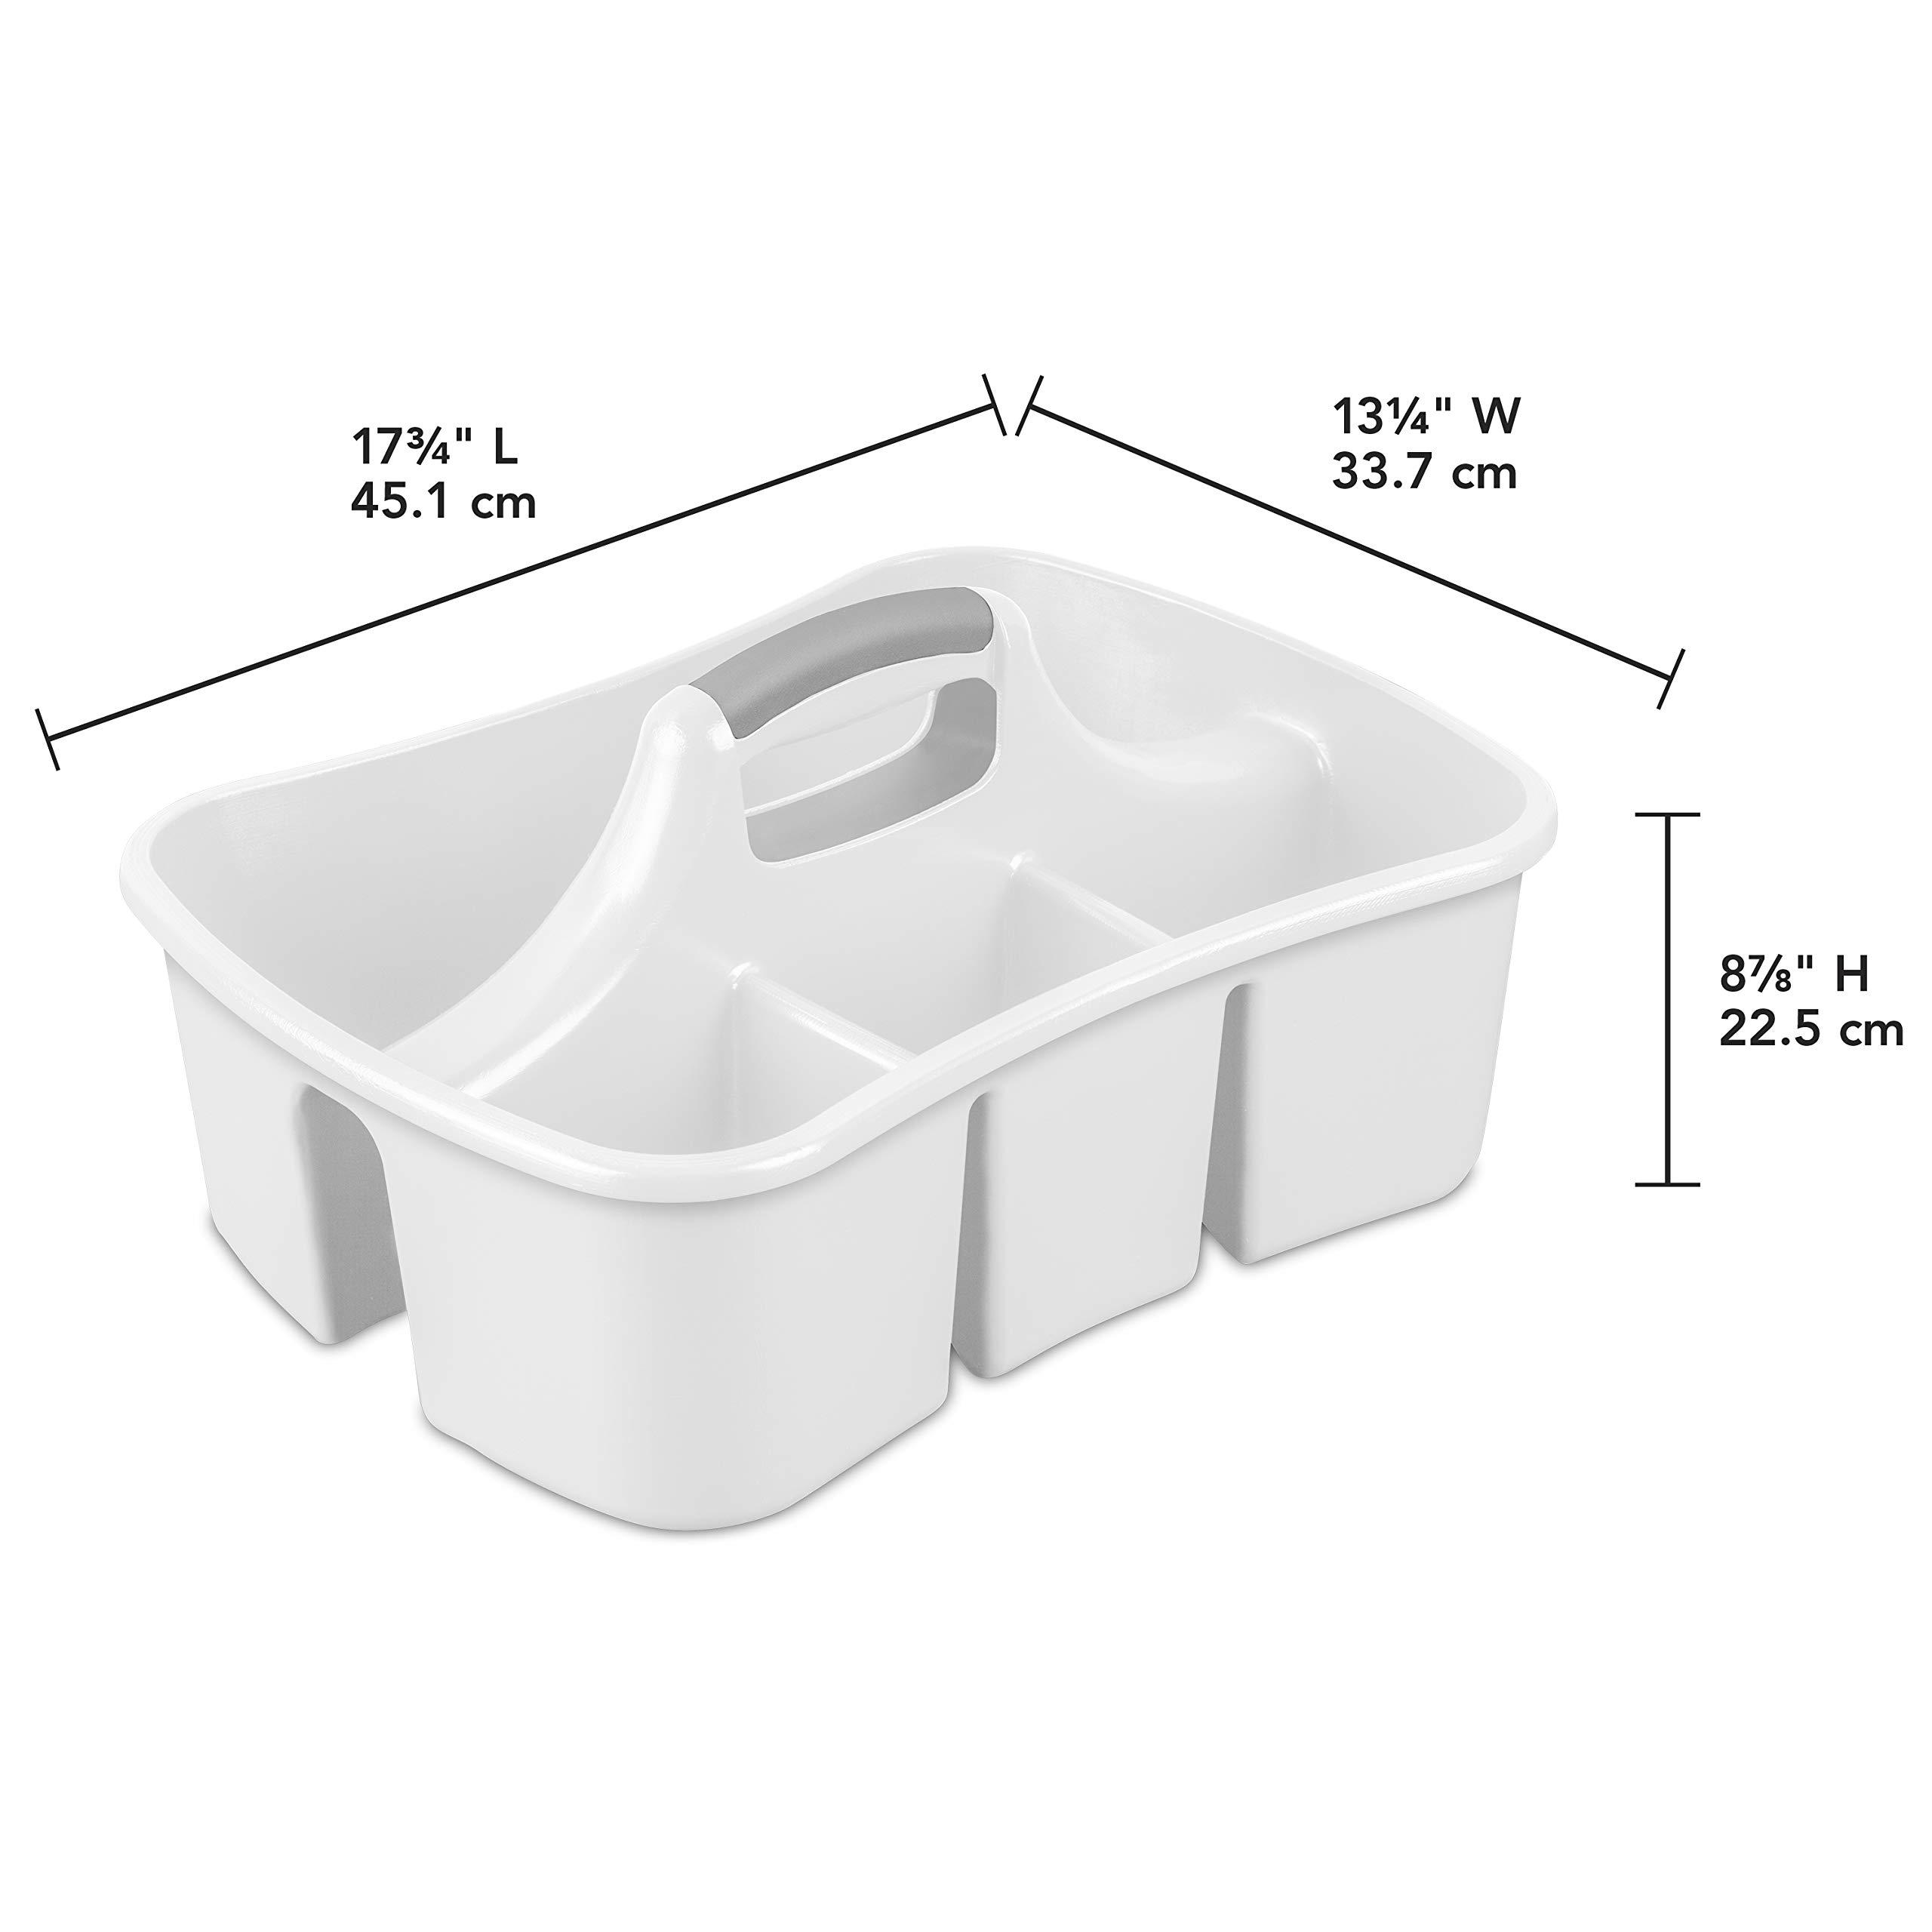 Sterilite 15888006 Divided Ultra Caddy, White Caddy w/ Titanium Insert, 6-Pack by STERILITE (Image #3)